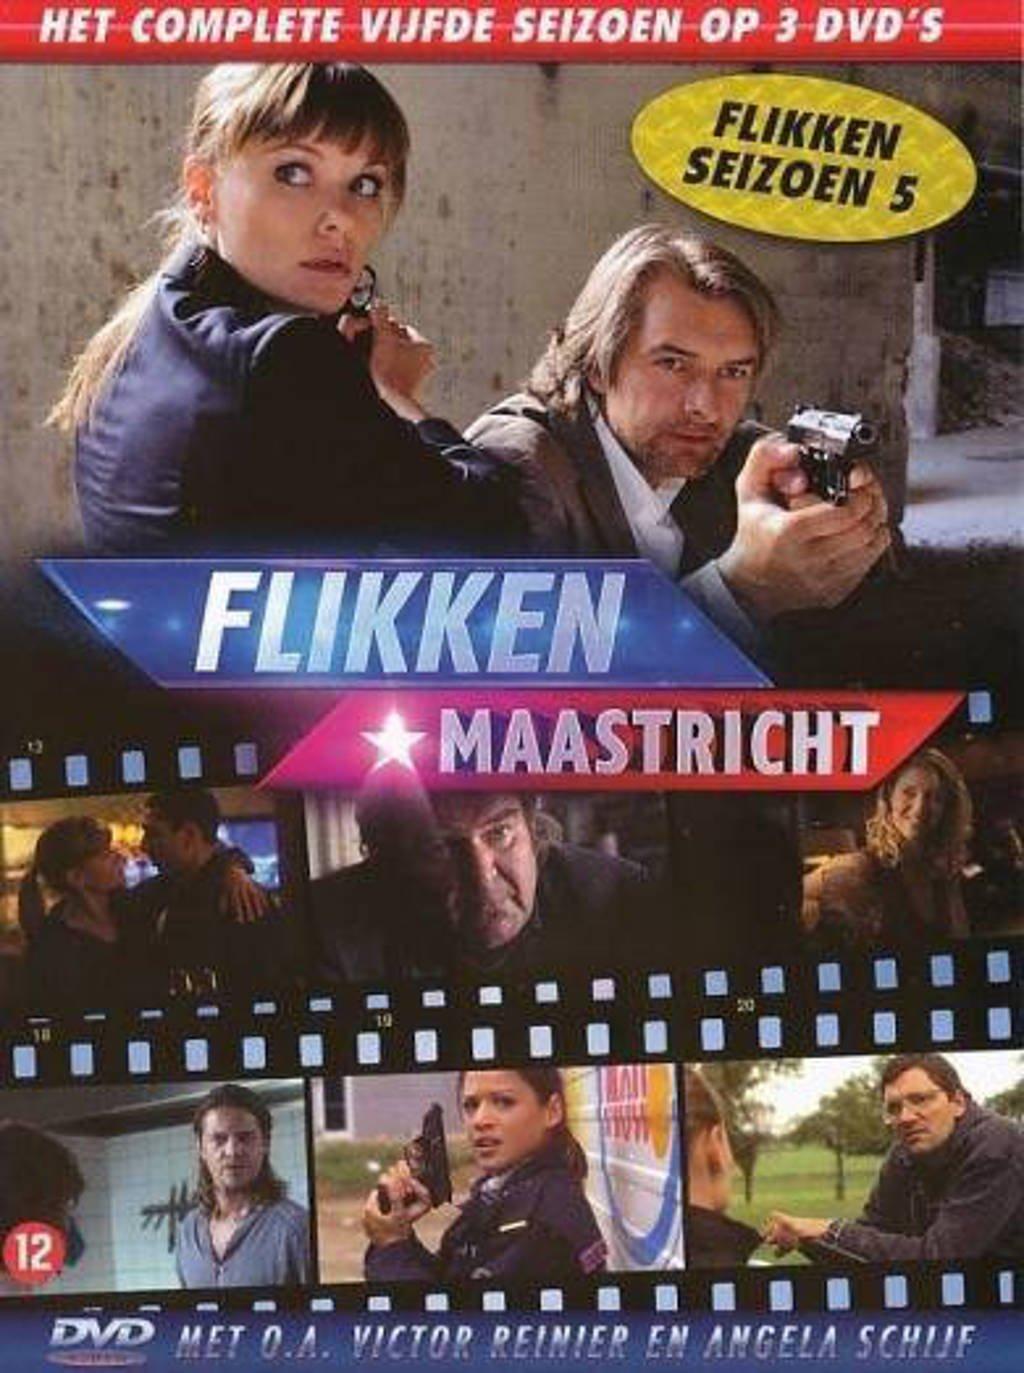 Flikken Maastricht - Seizoen 5 (DVD)